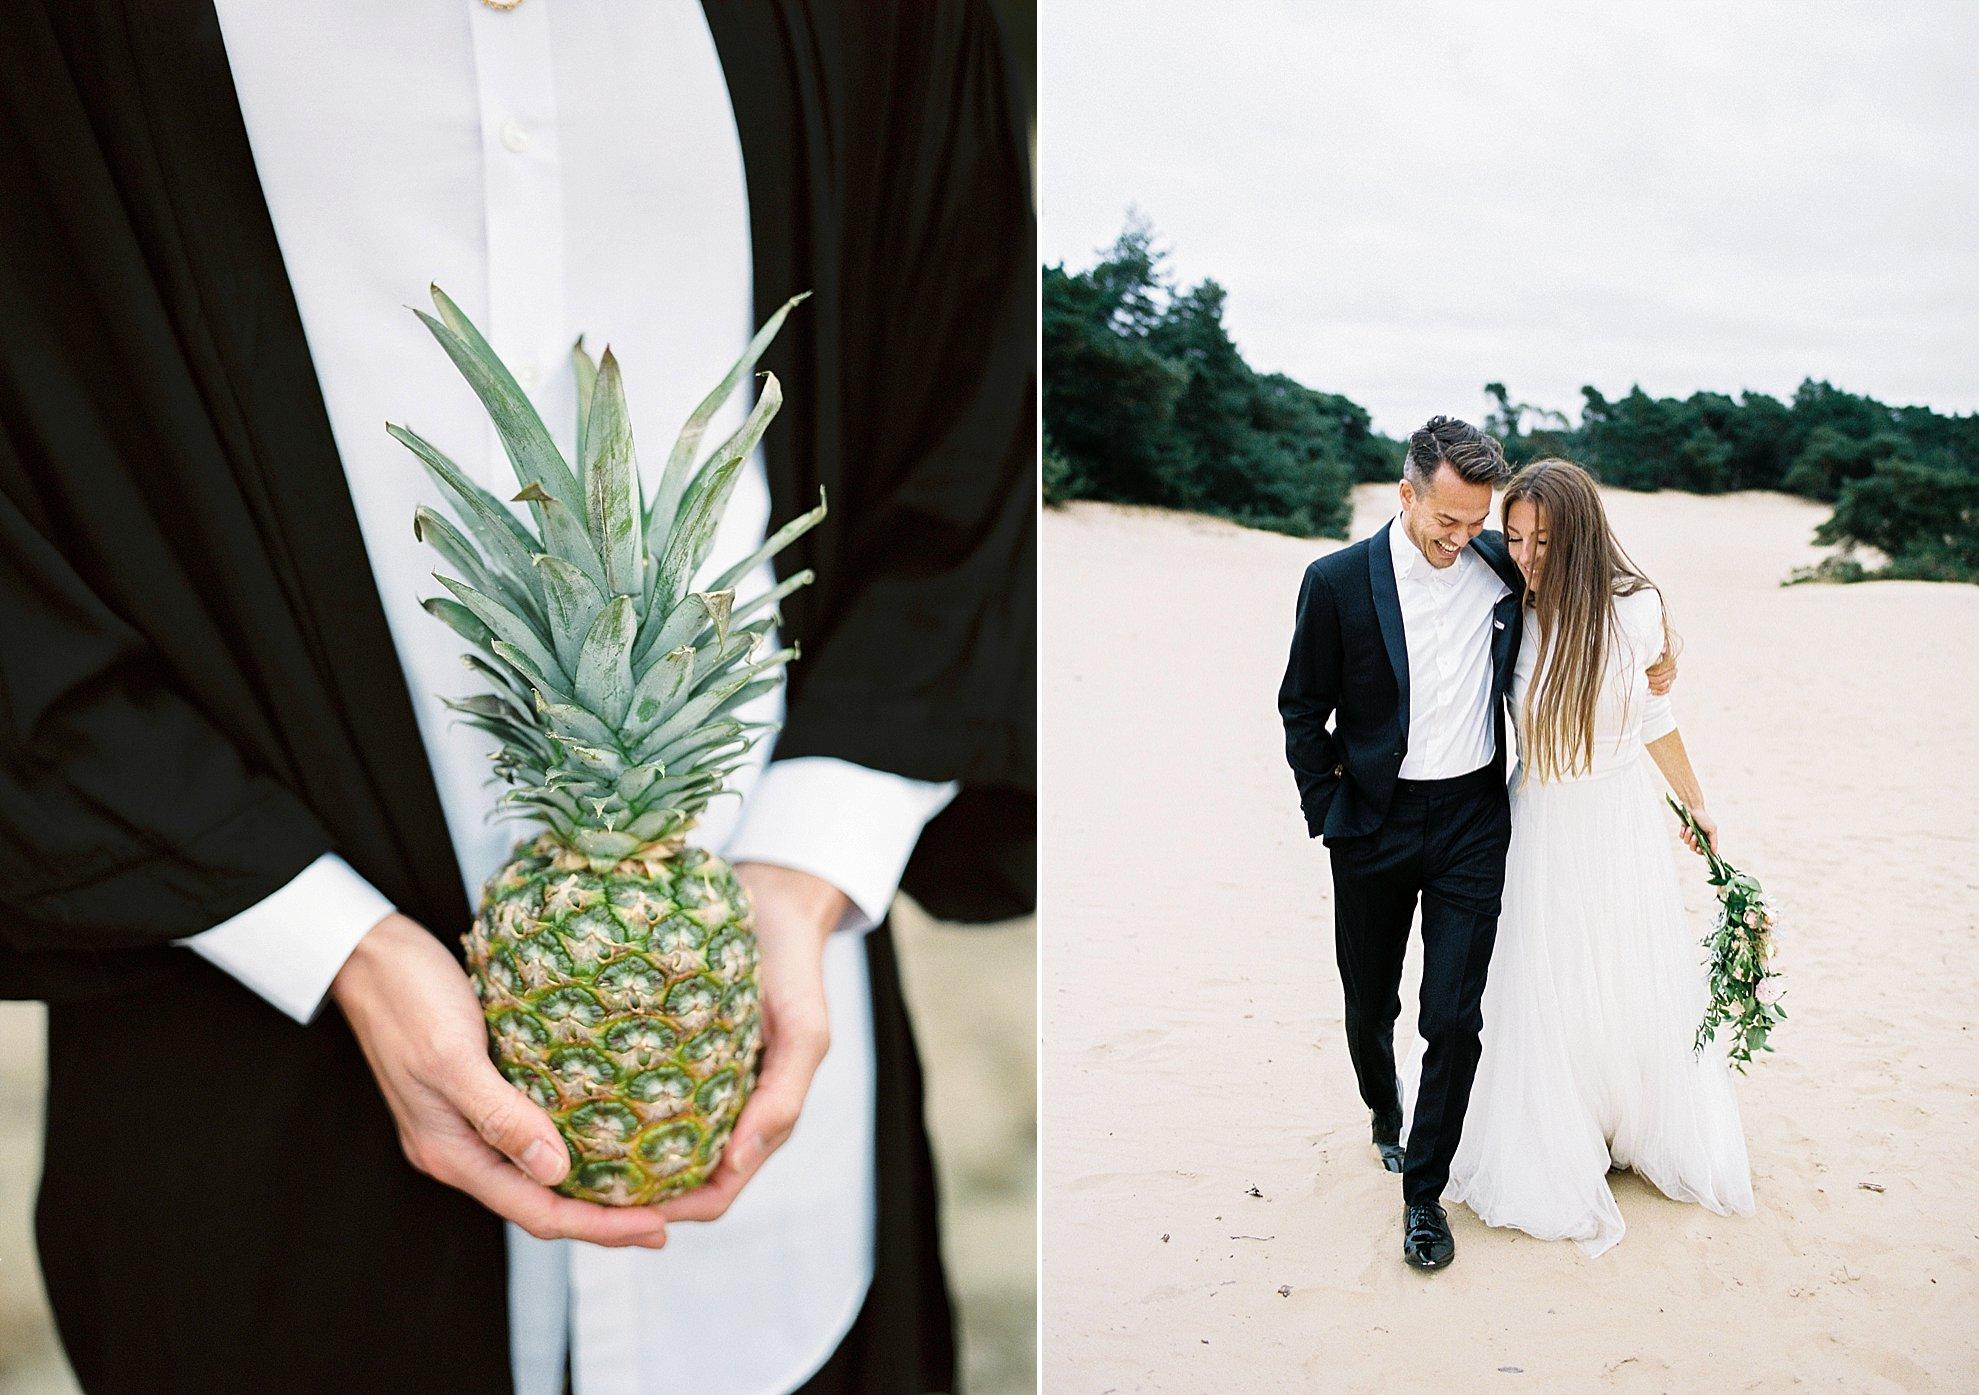 Amanda-Drost-photography-fine-art-nederland-couple-shoot-editorial_0017.jpg